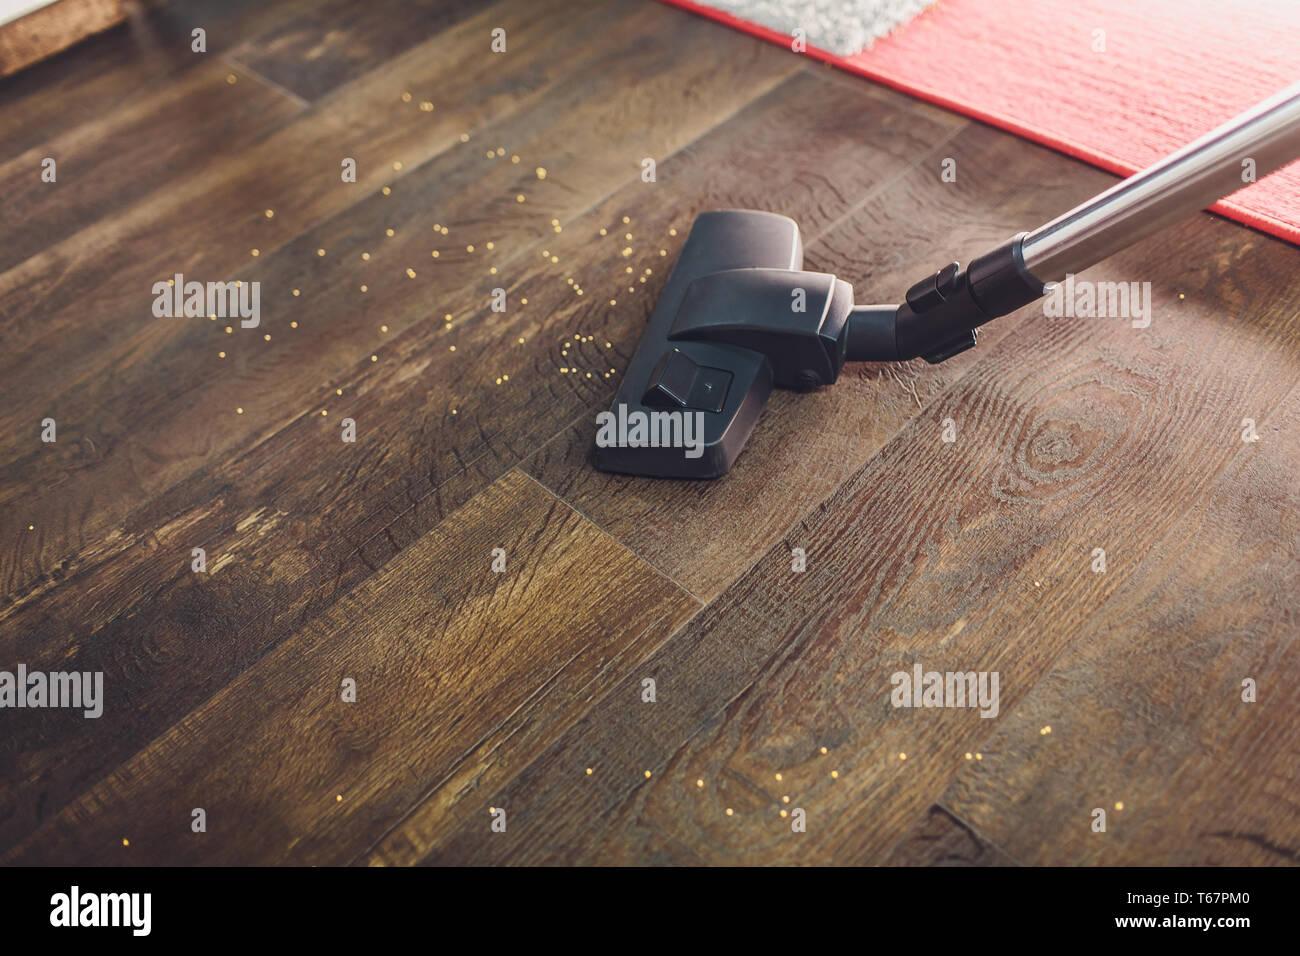 Dark head of a modern vacuum cleaner being used while